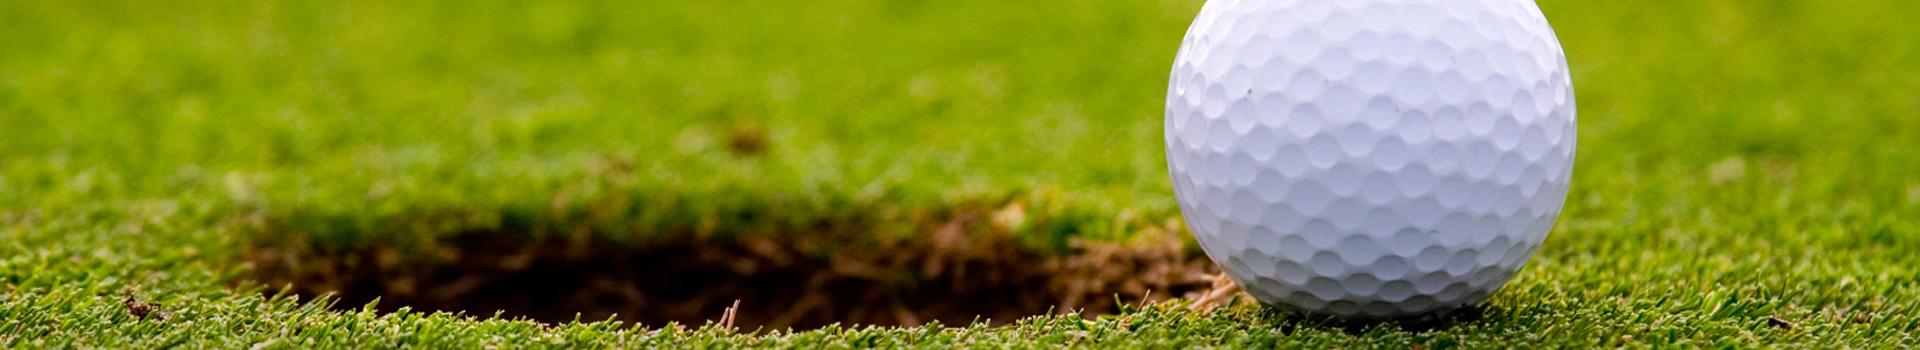 baehmann's golf and games, baehmann's golf course, golf course, mini golf, miniature golf, foot golf